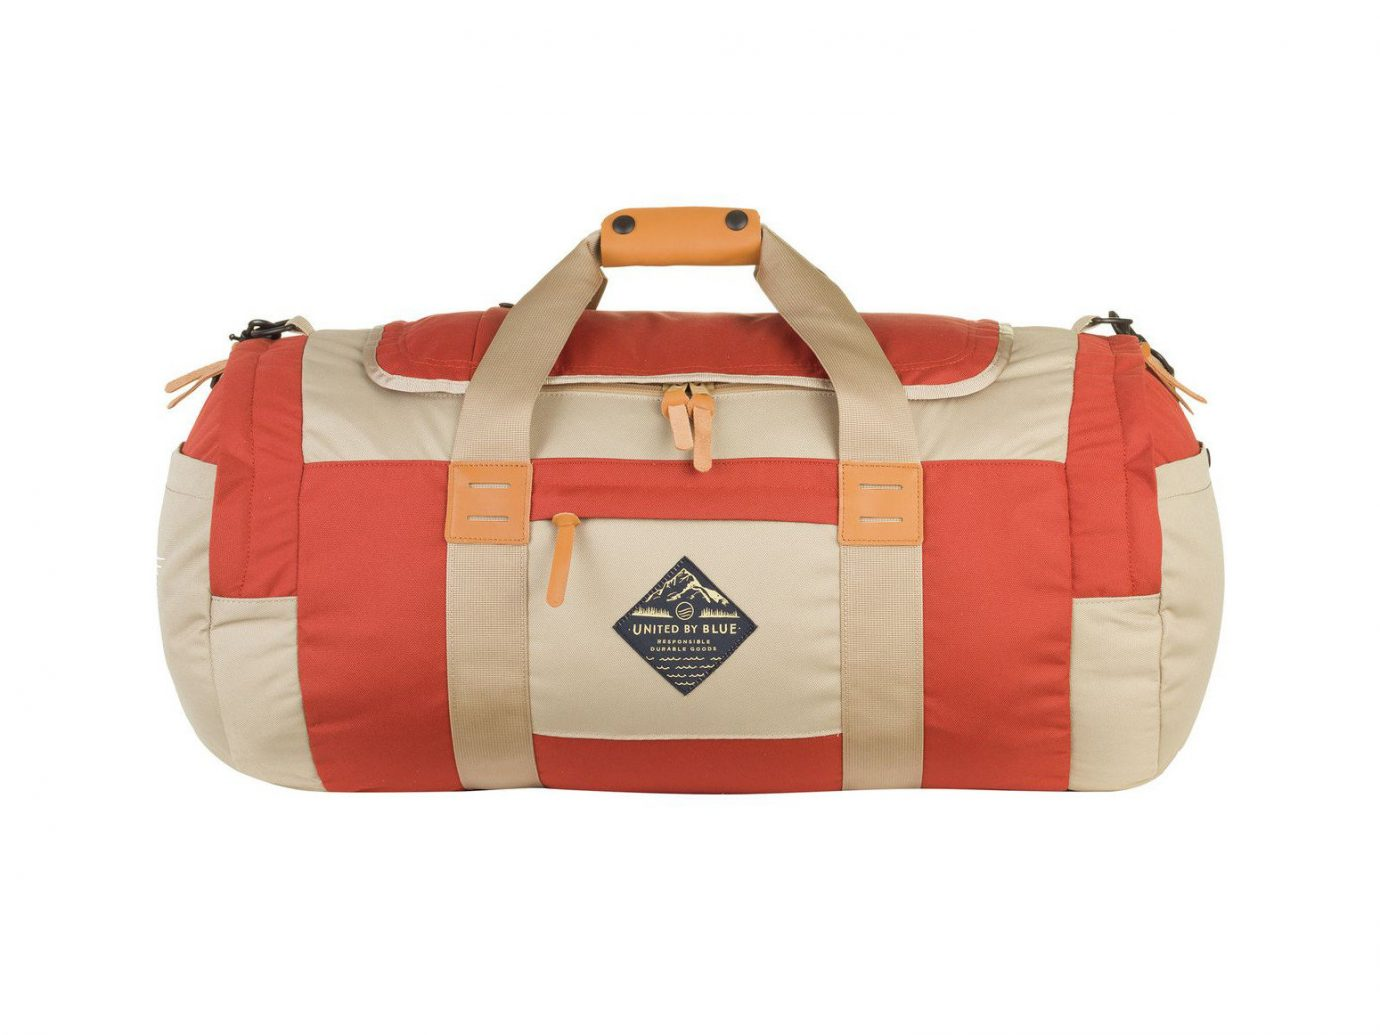 Packing Tips Style + Design Travel Shop bag red product shoulder bag handbag beige product design luggage & bags hand luggage duffel bag